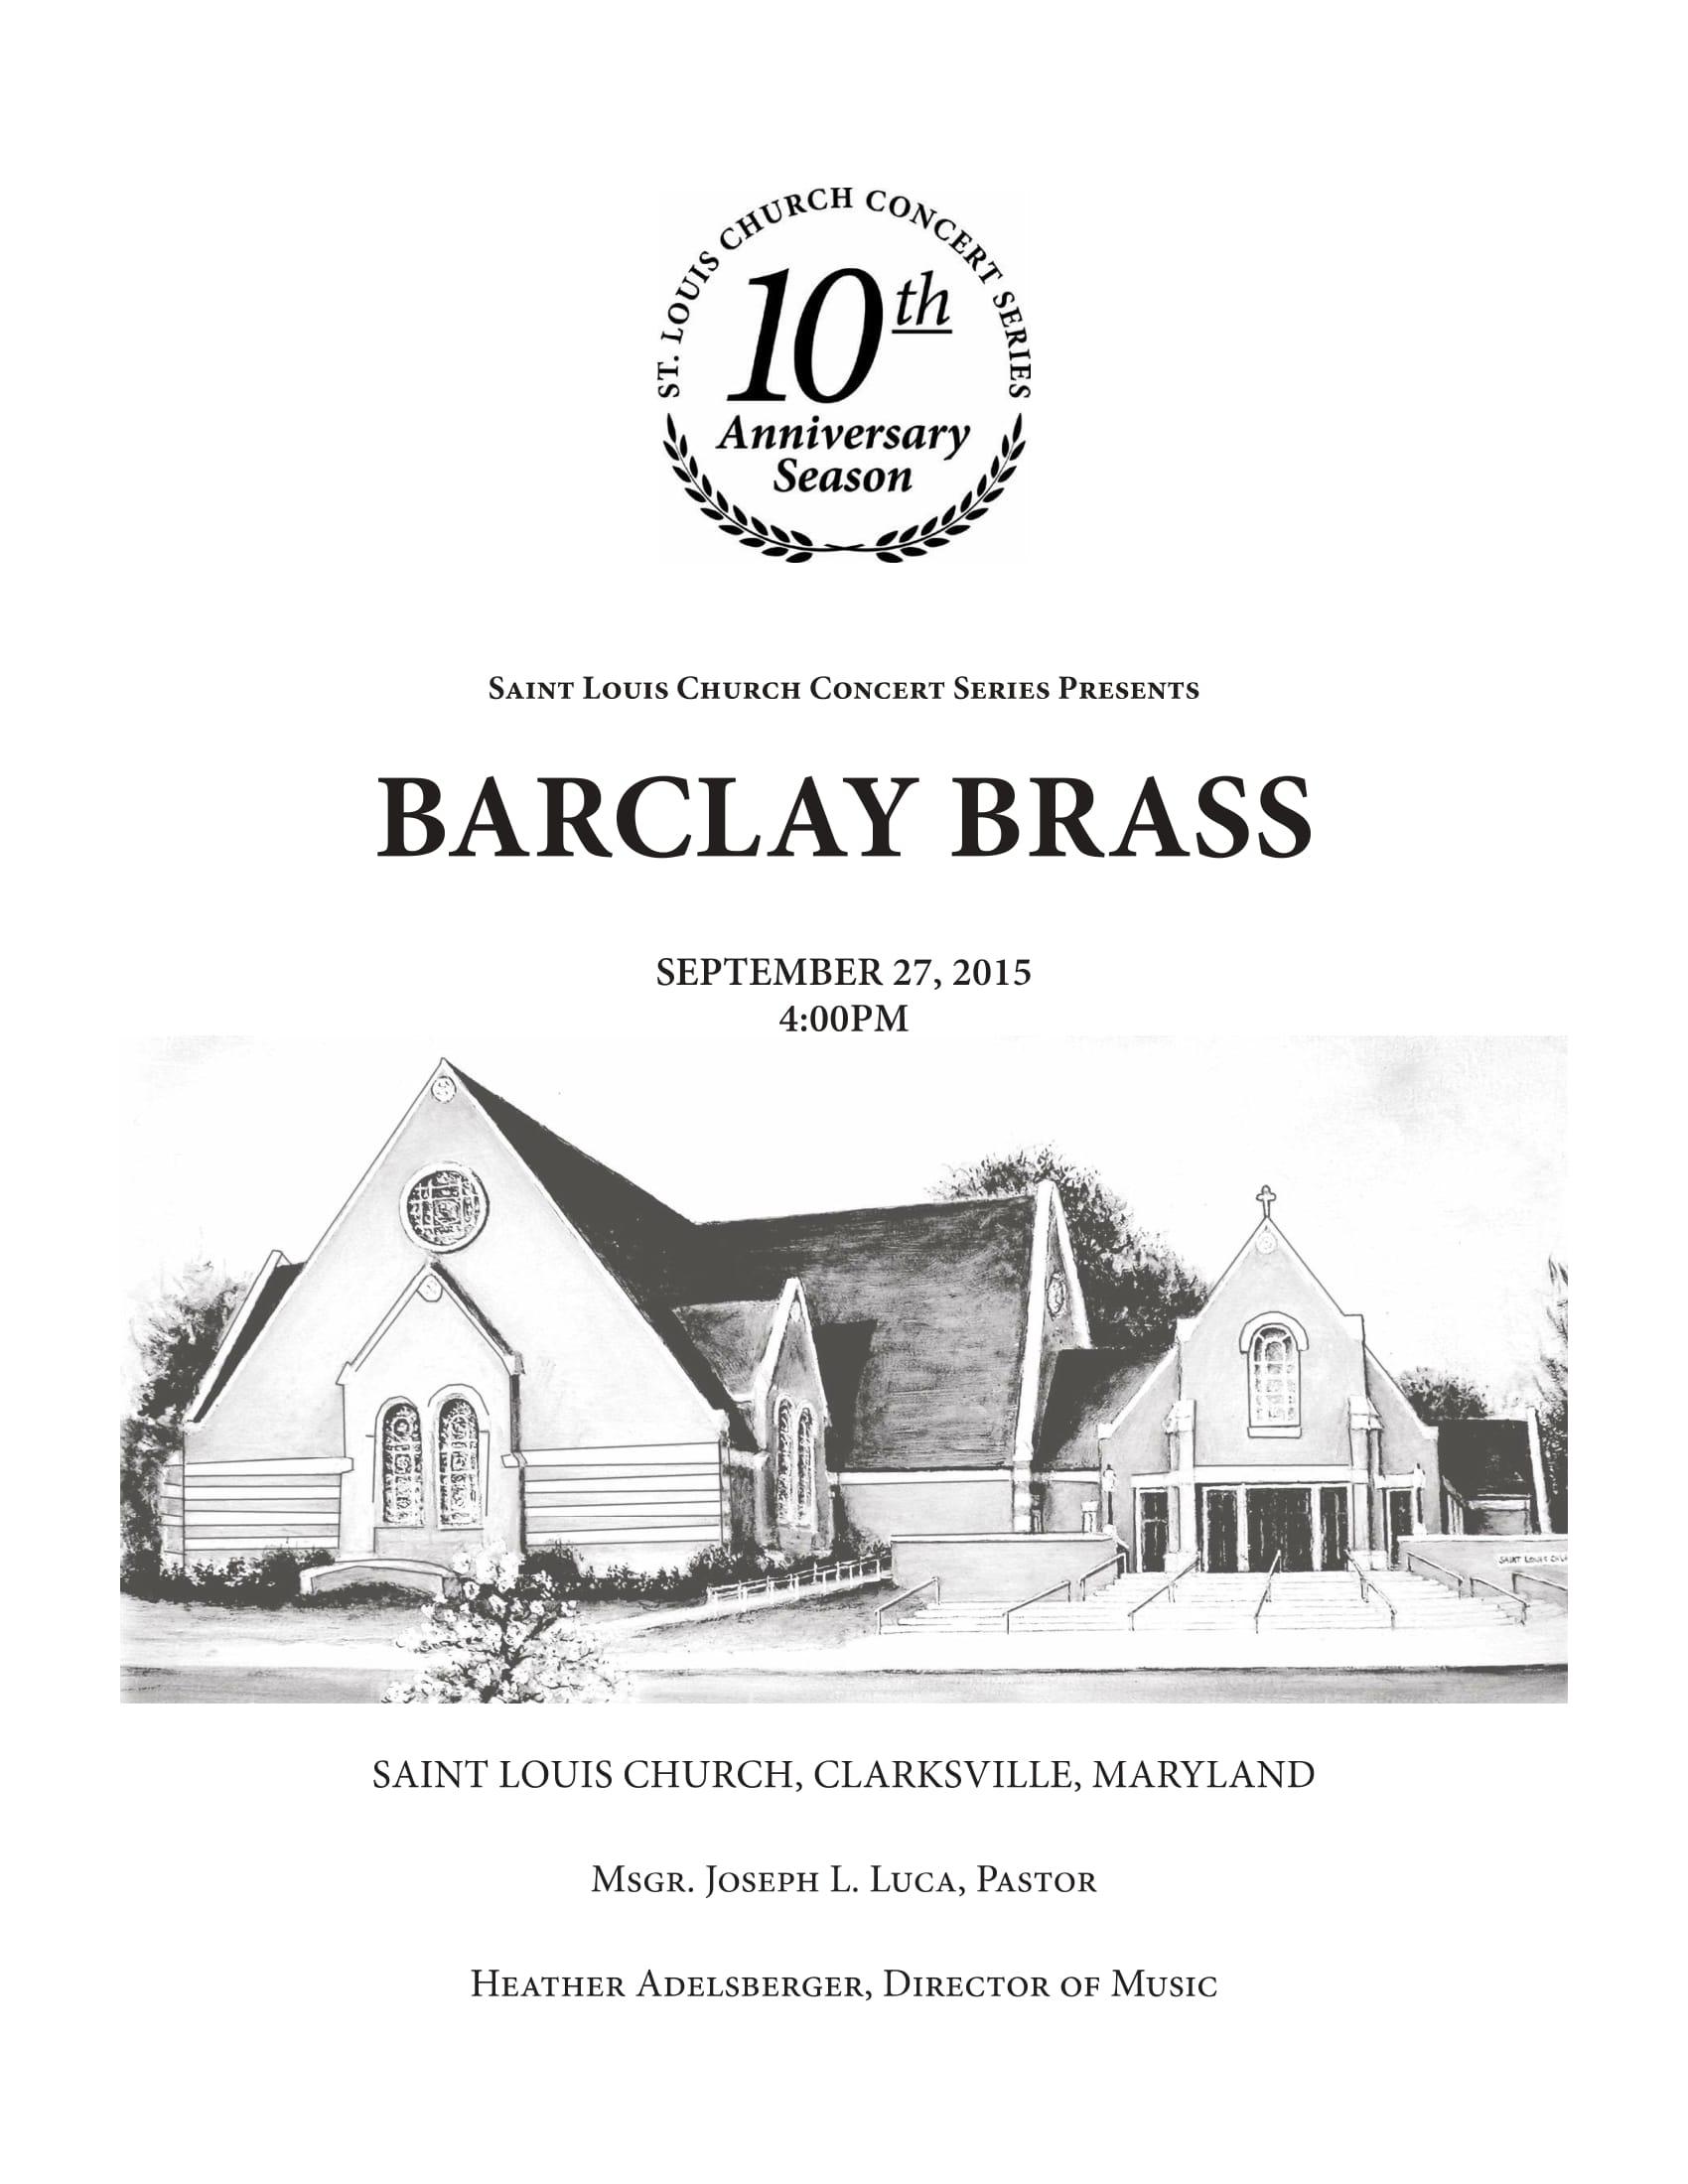 Barclay-01-1.jpg